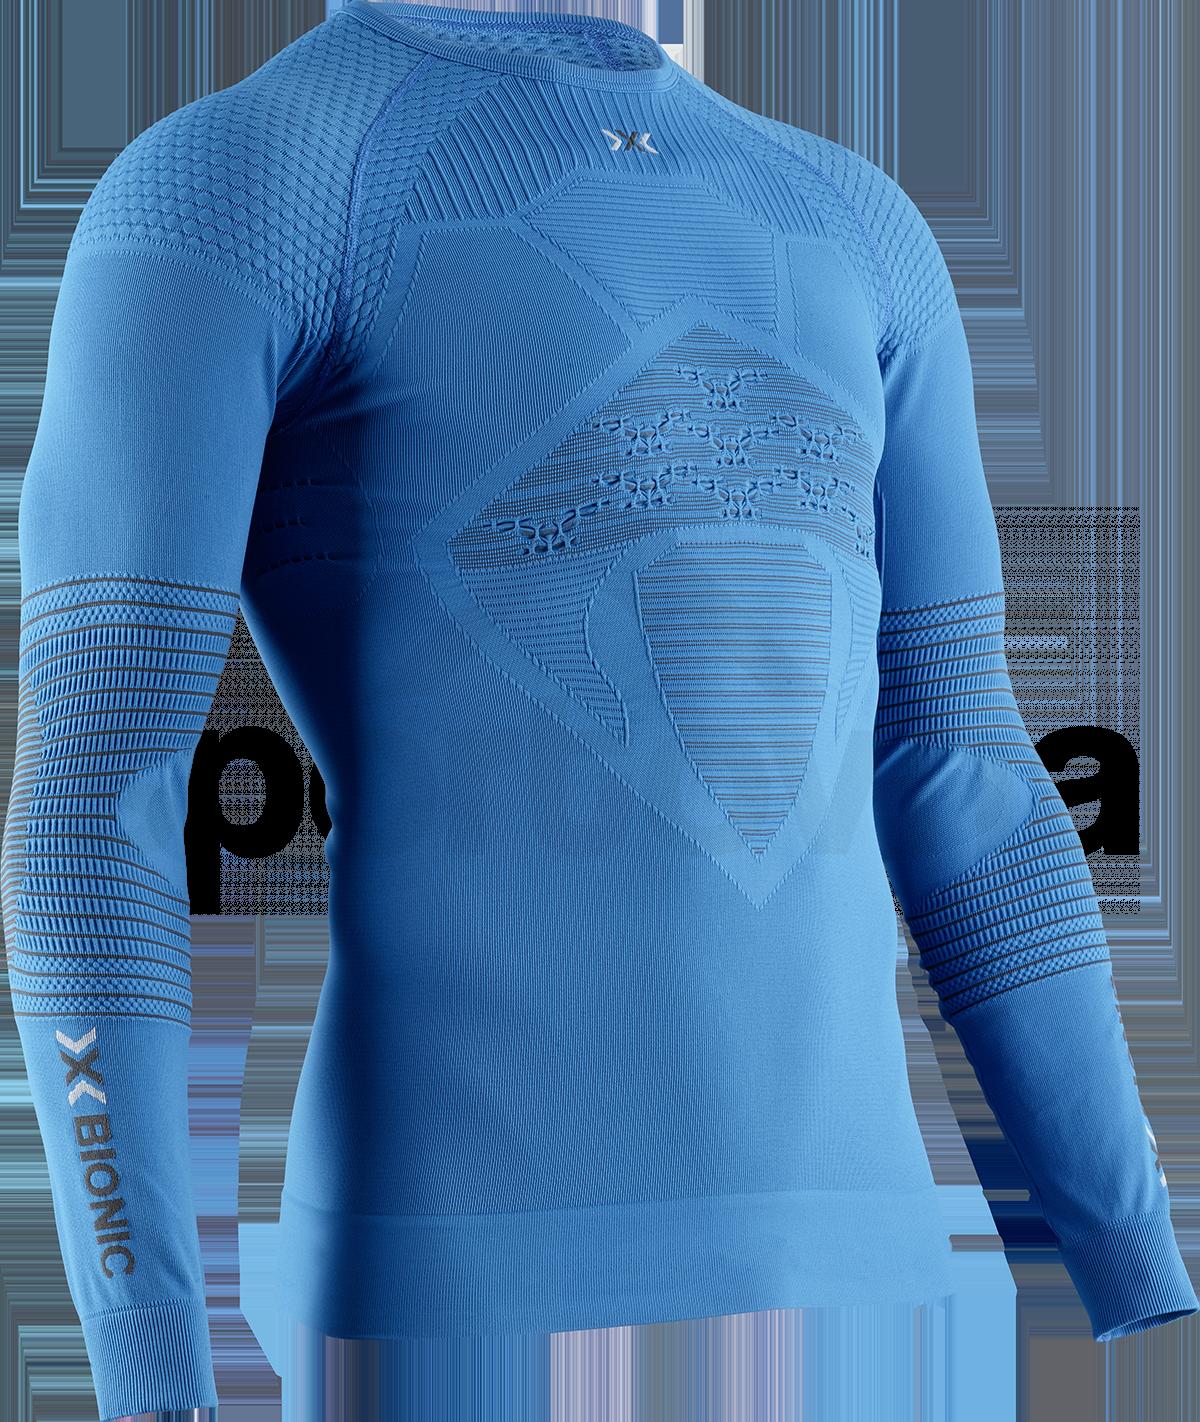 X-Bionic Energizer 4.0 Shirt Round Neck LG SL M